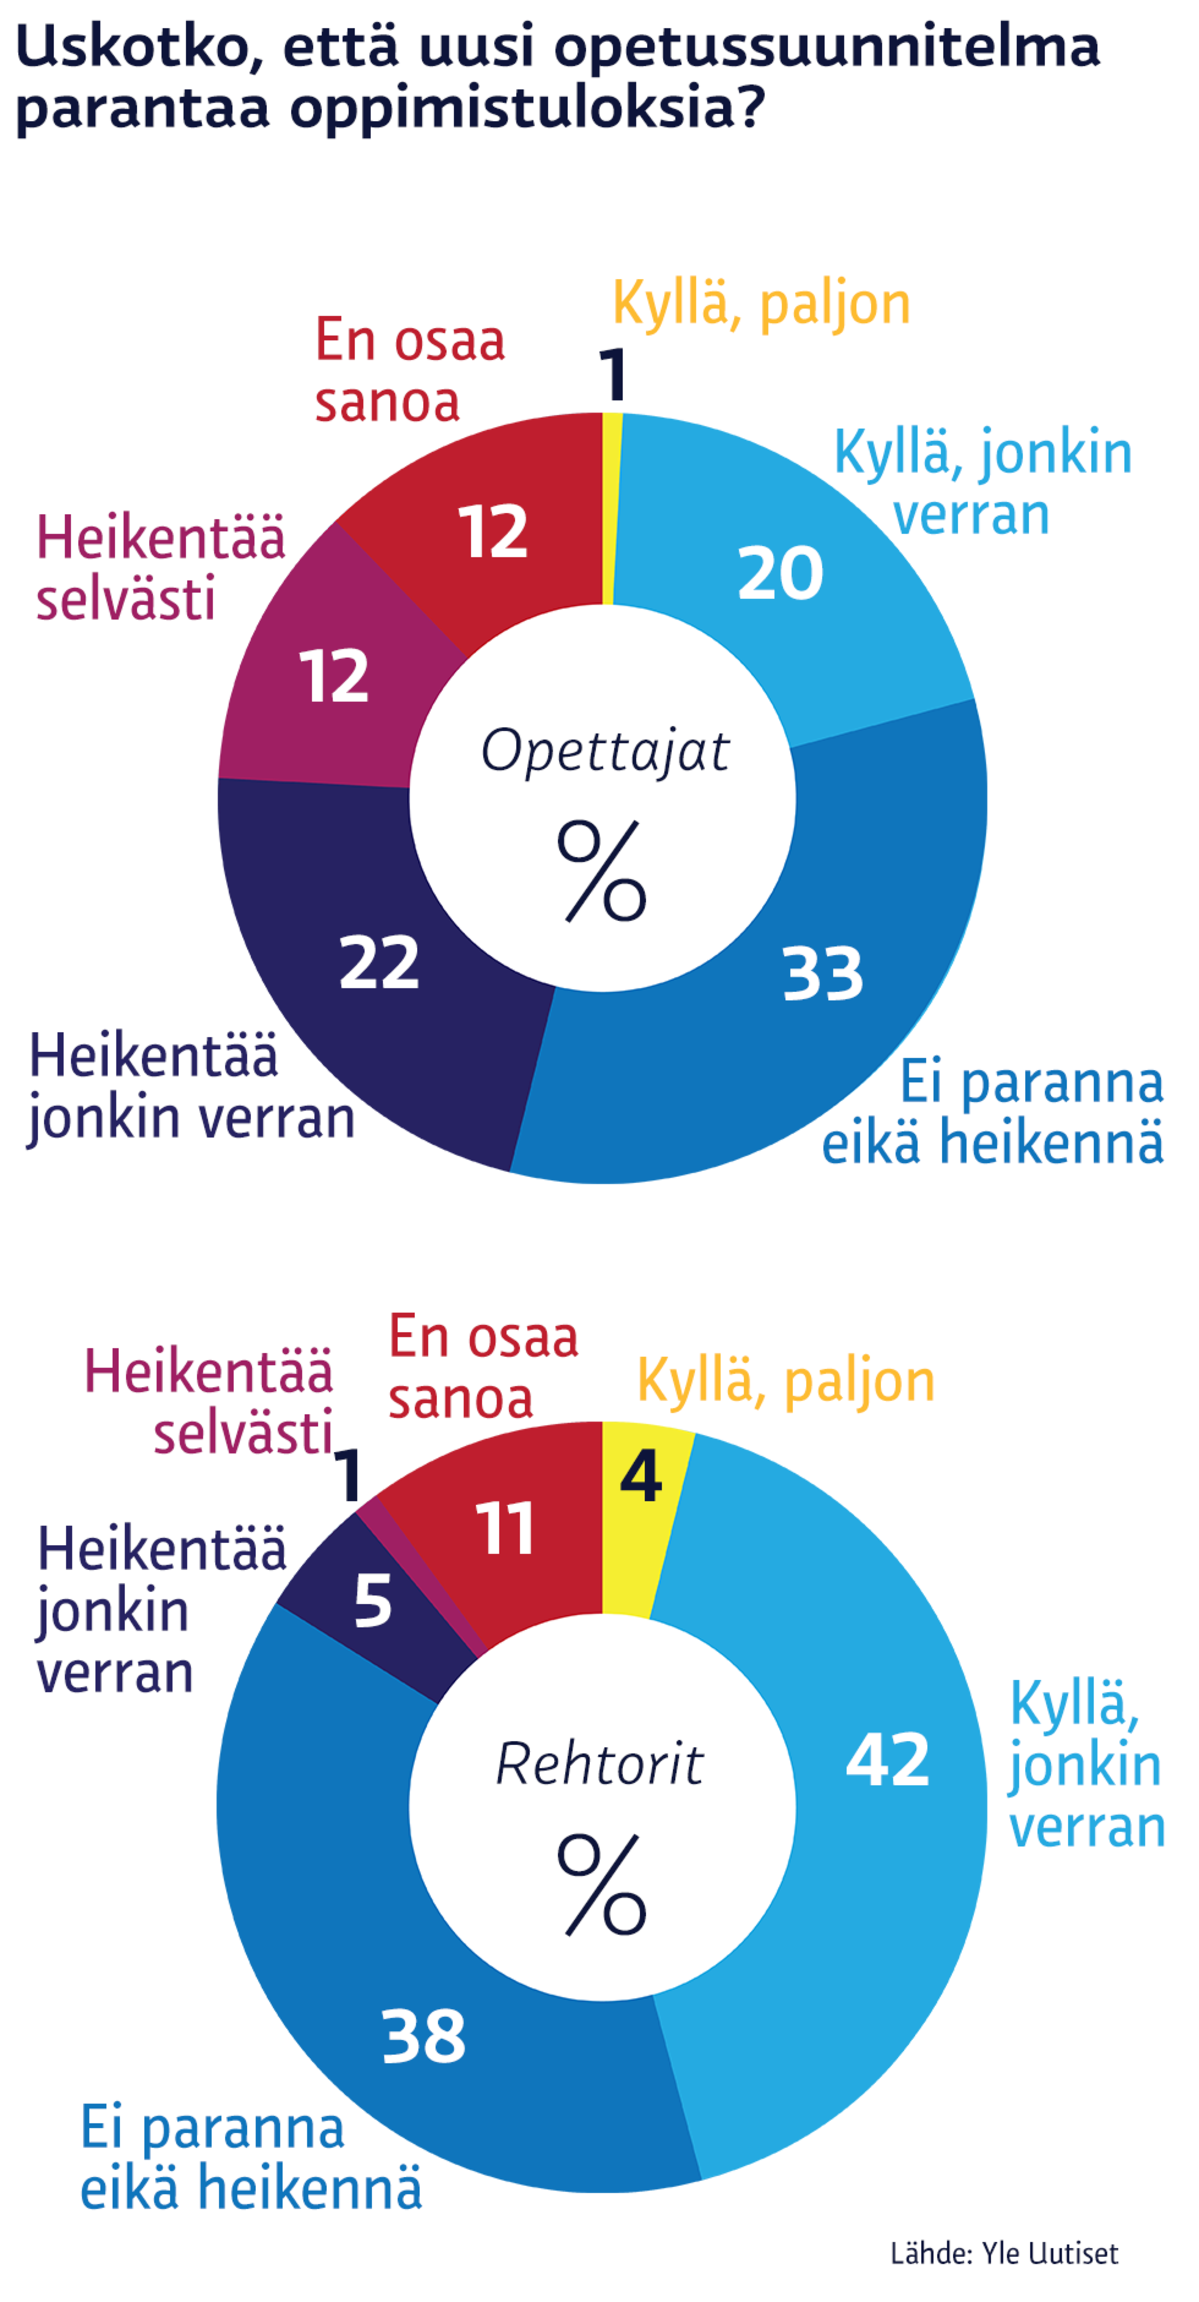 uusi opetussuunnitelma 2016 Ulvila